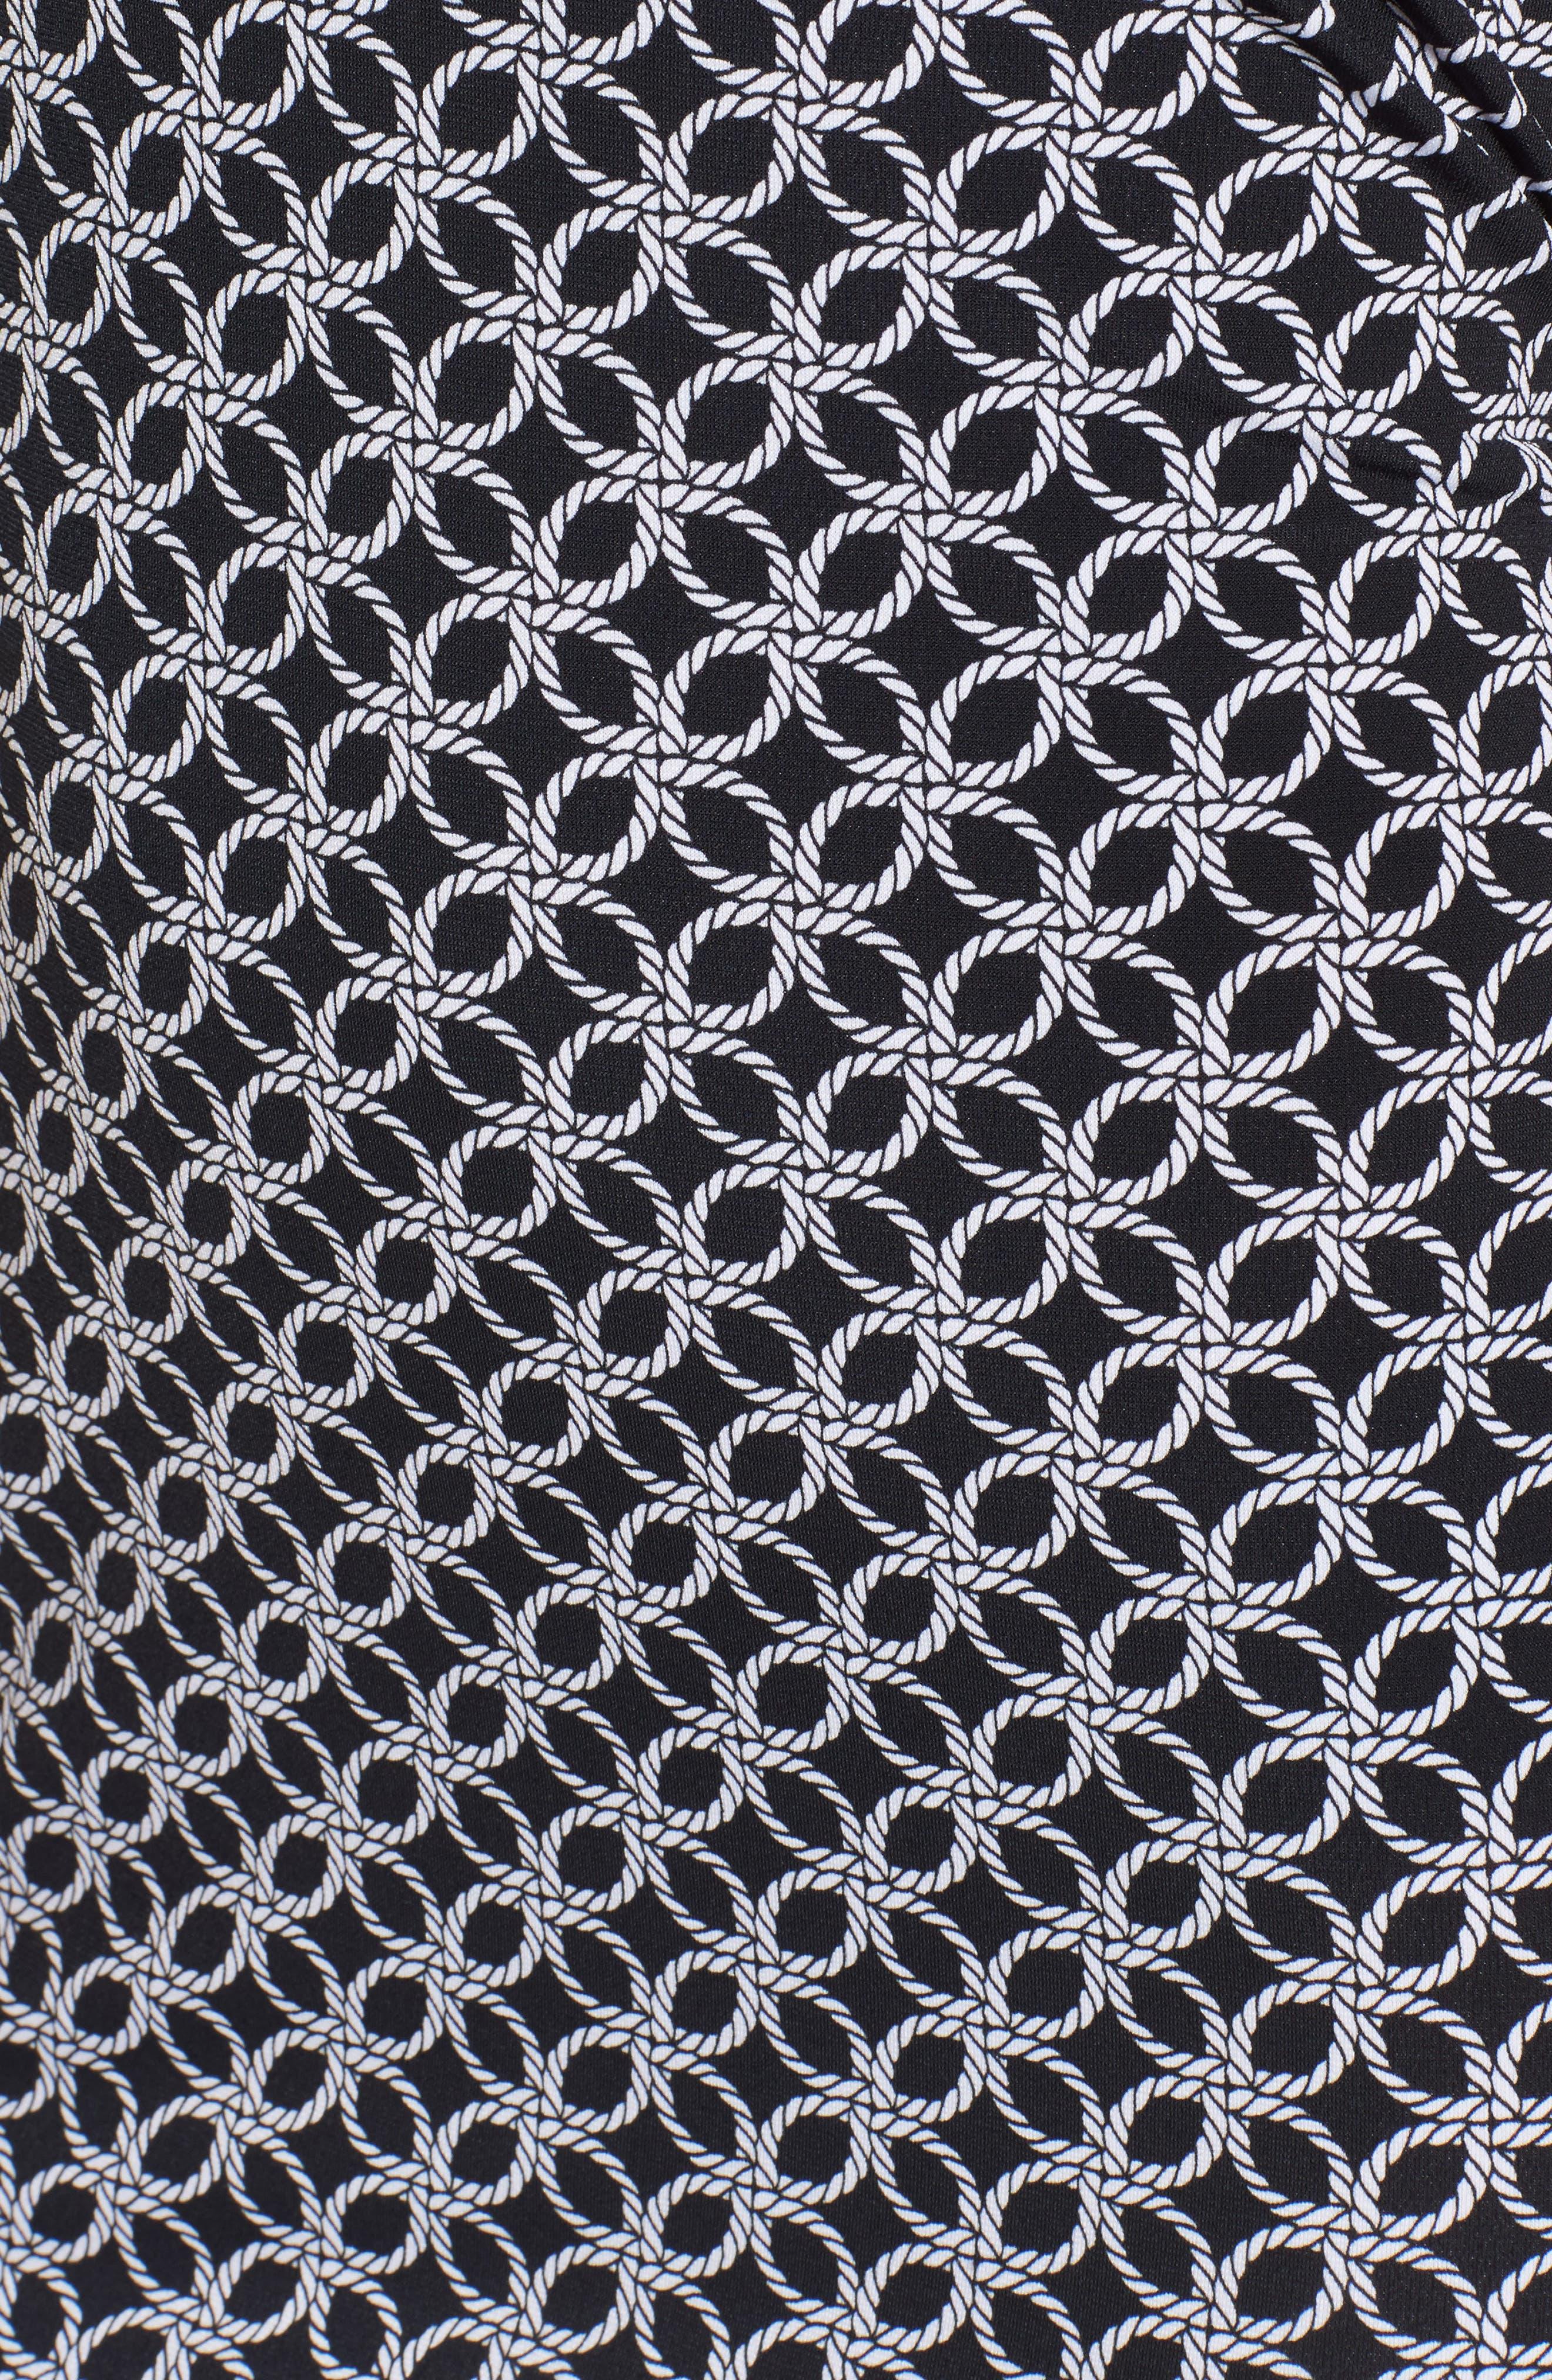 Rope Twist Body-Con Dress,                             Alternate thumbnail 5, color,                             Black/ White